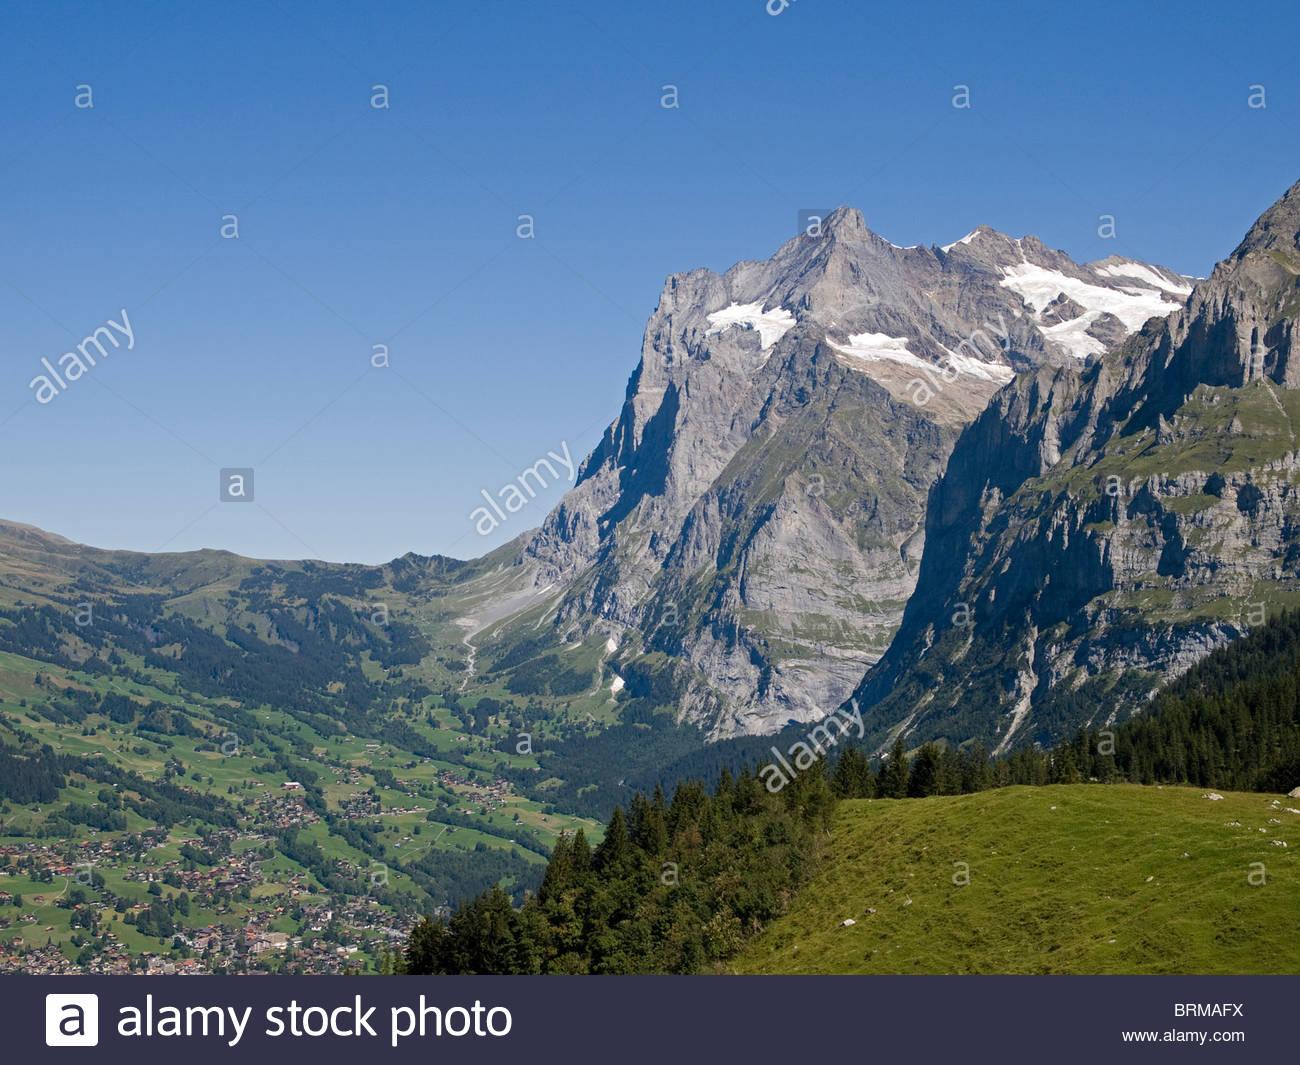 Grindlewald village below the Grosse Scheidegg and Wetterhorn - Stock Image